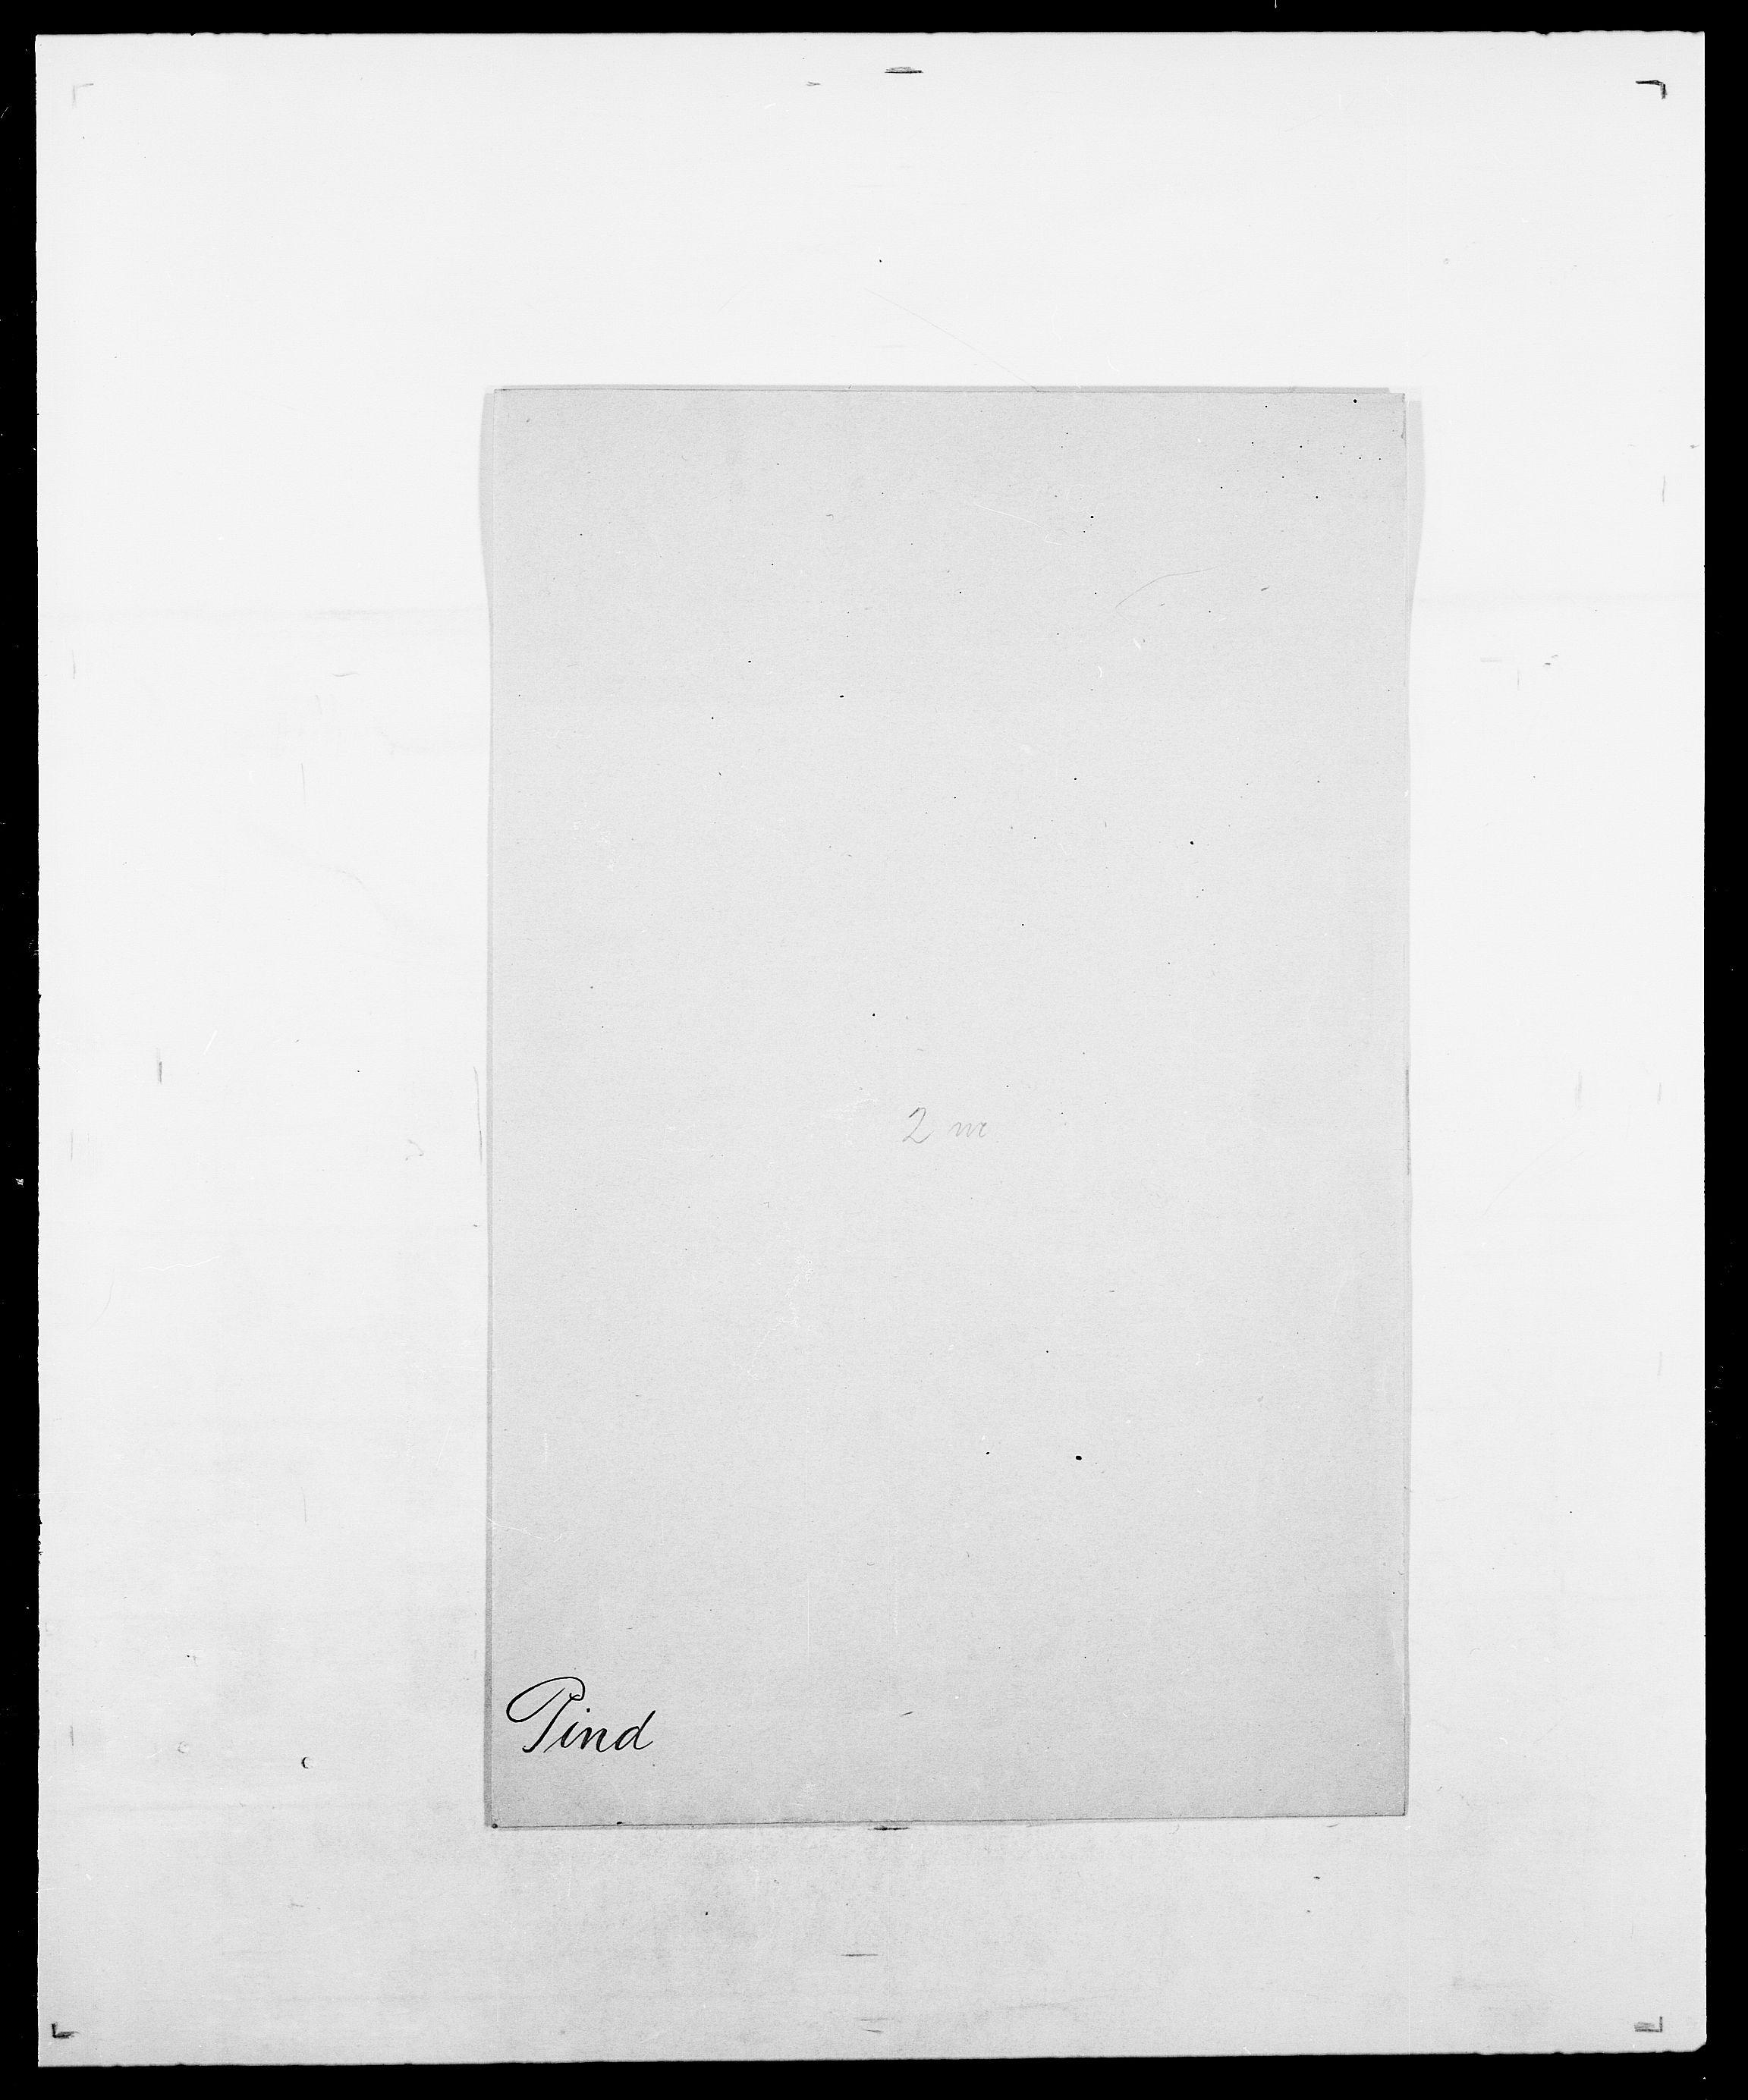 SAO, Delgobe, Charles Antoine - samling, D/Da/L0030: Paars - Pittelkov, s. 549